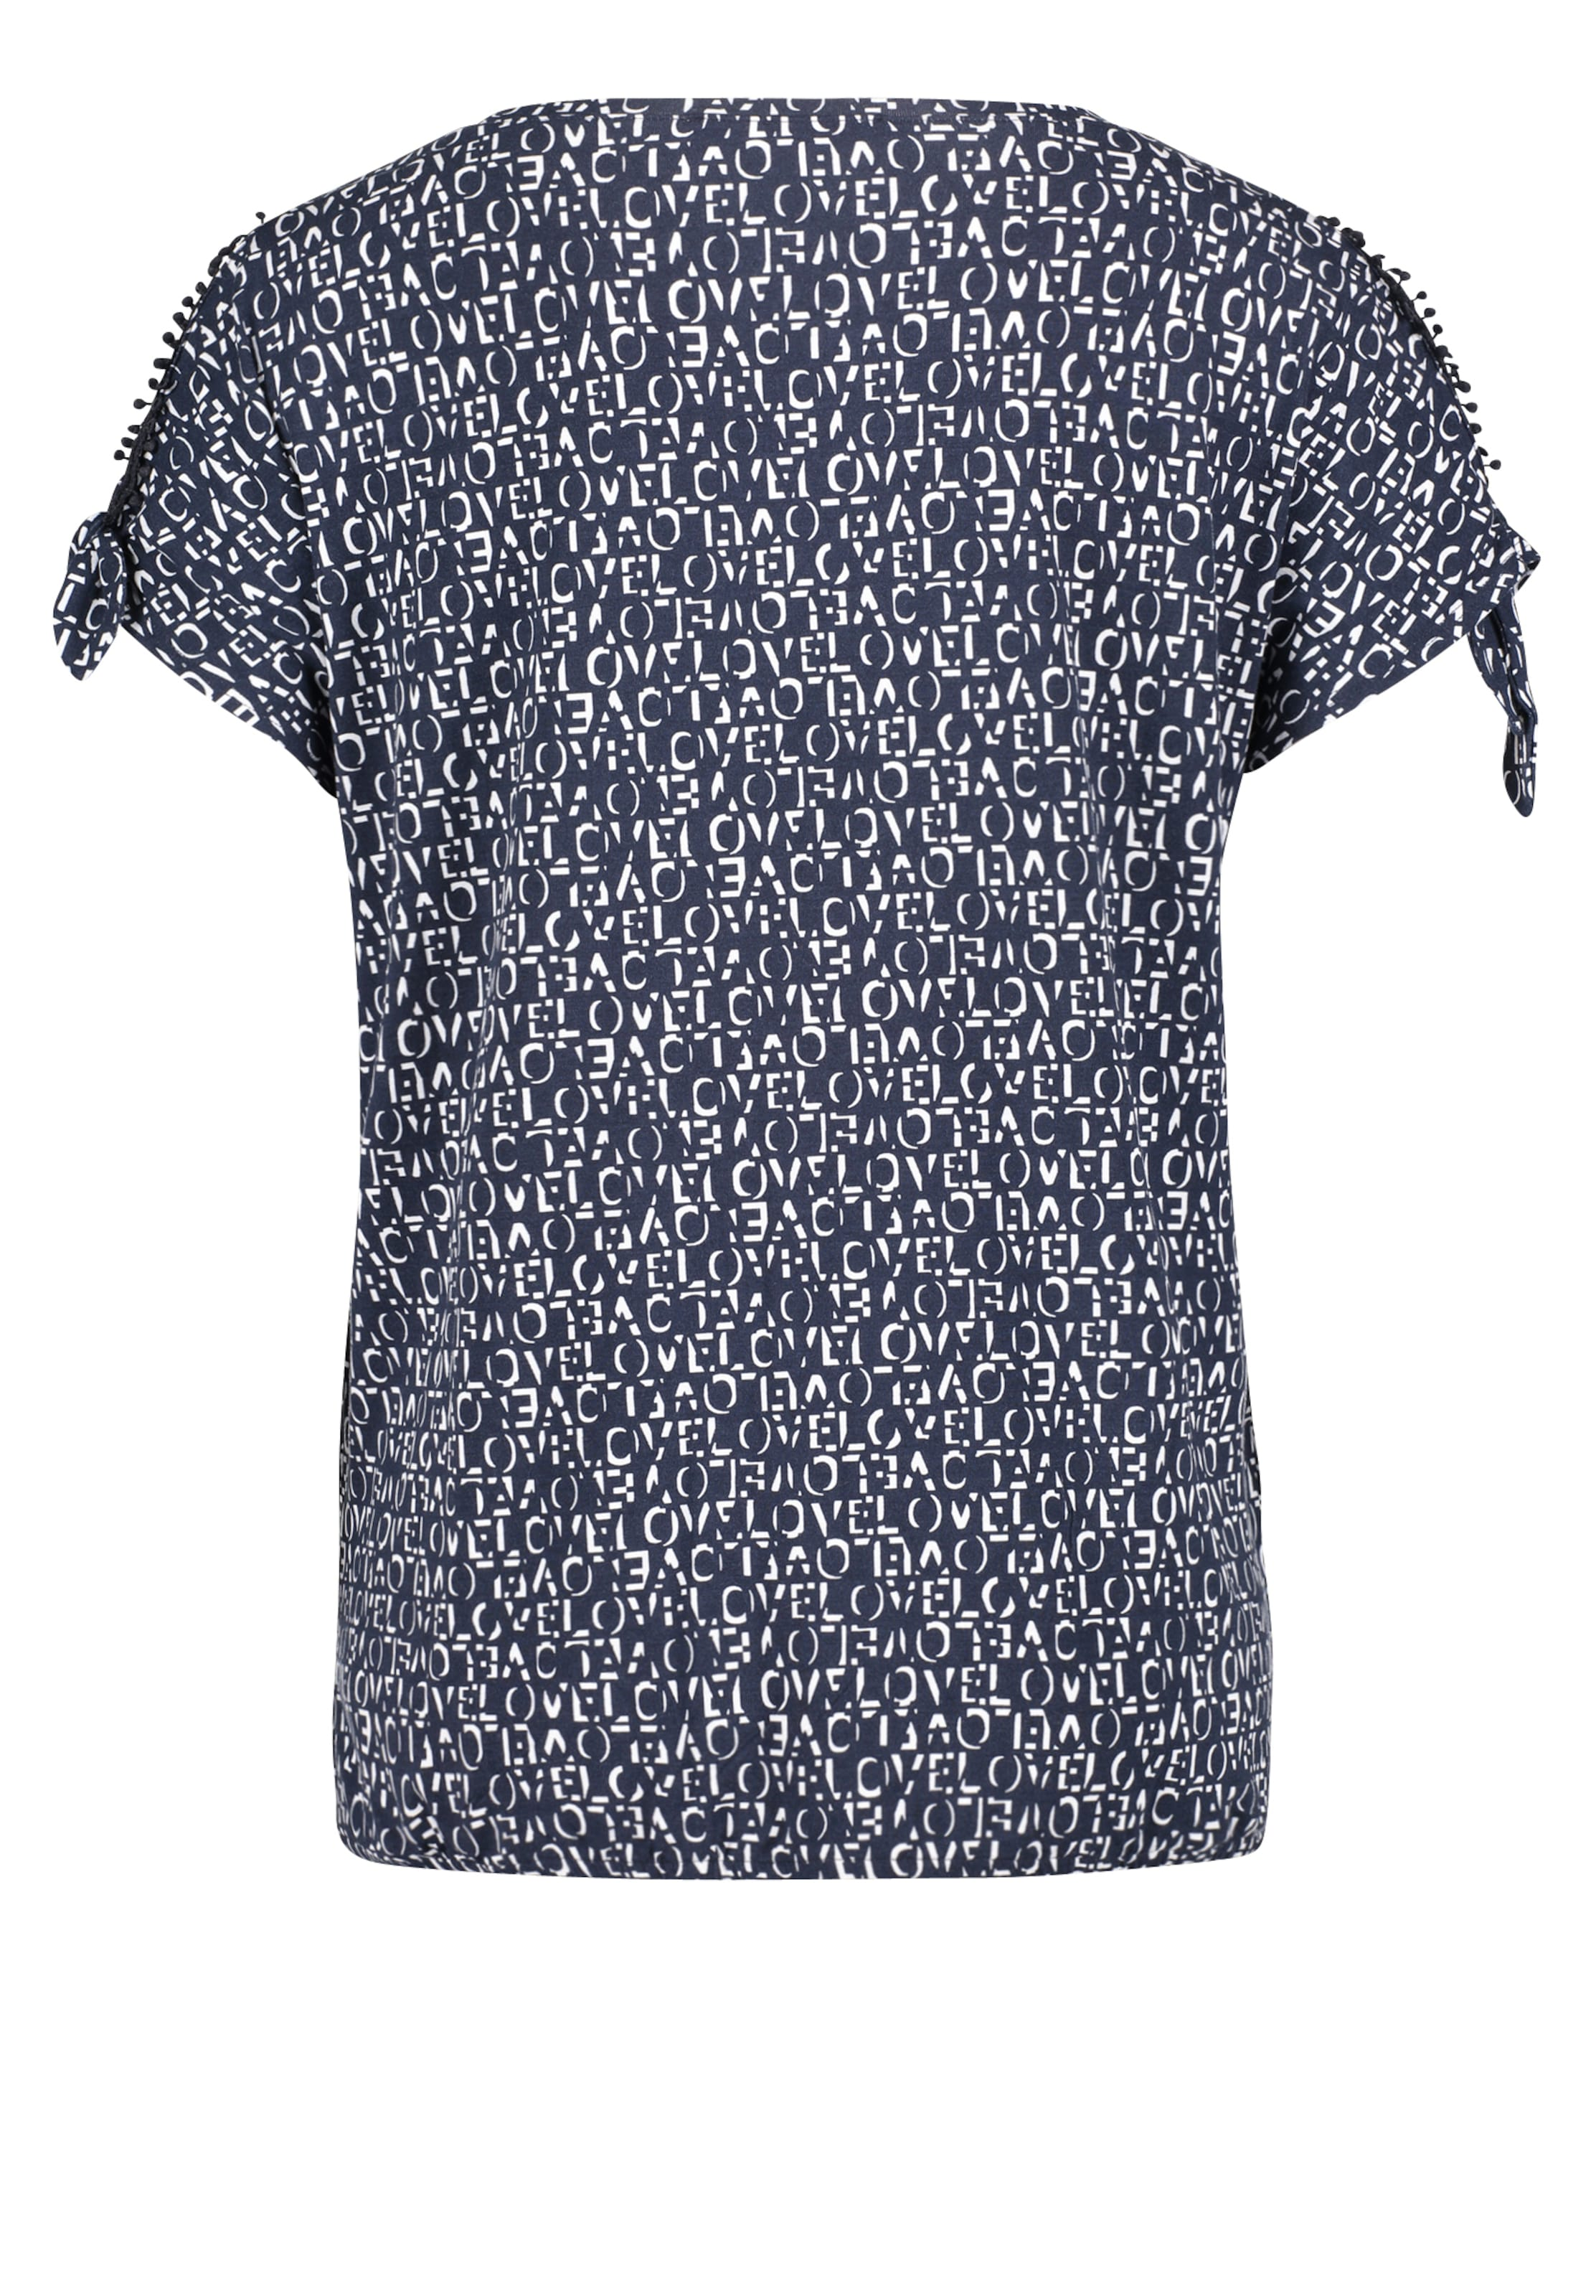 Co Shirt Bettyamp; Shirt NachtblauWeiß In Co In Bettyamp; c3ARjS5q4L